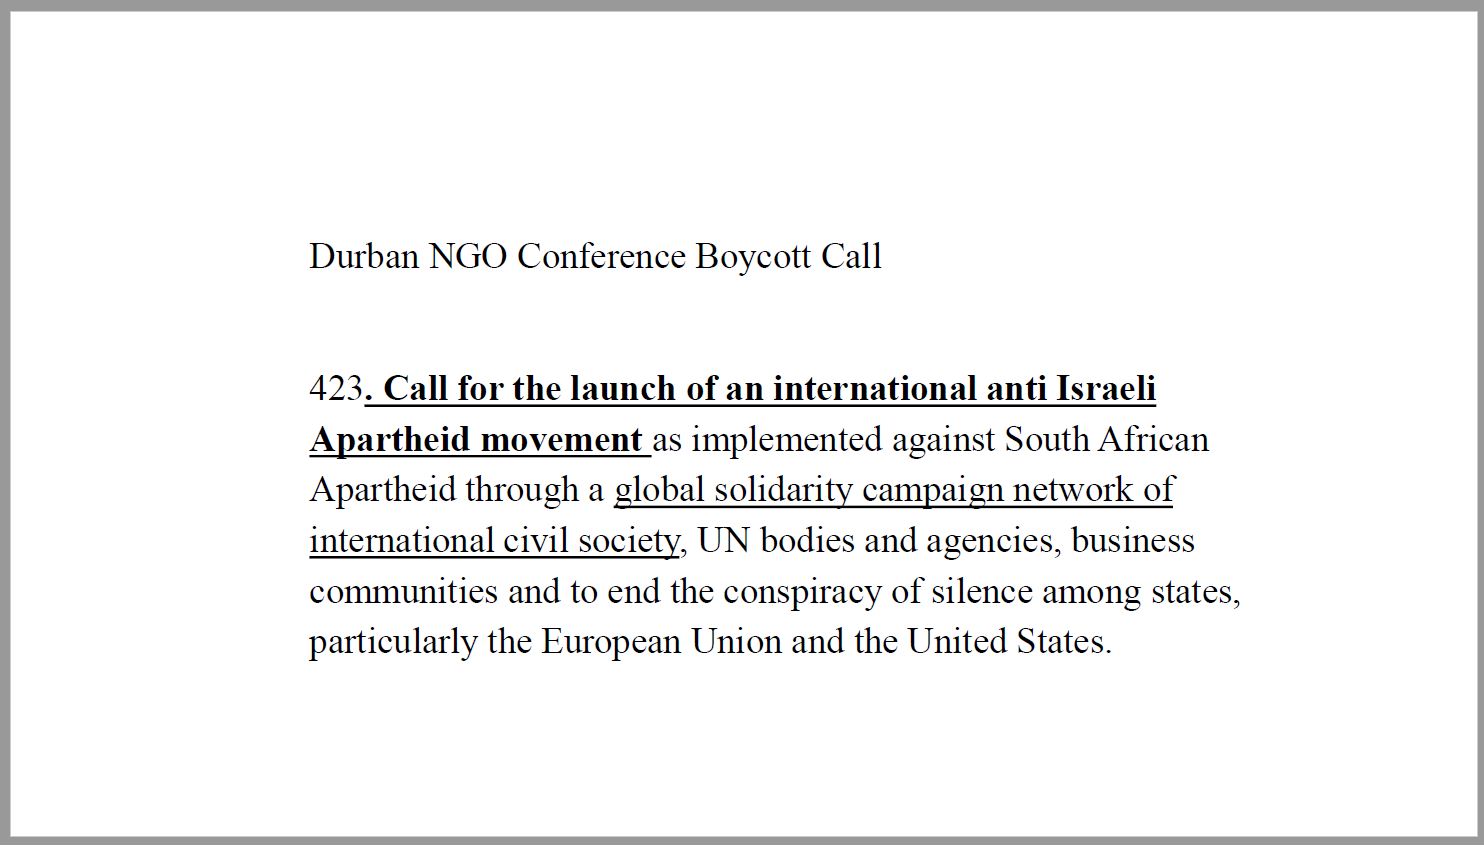 bds-history-durban-boycott-call-par-423